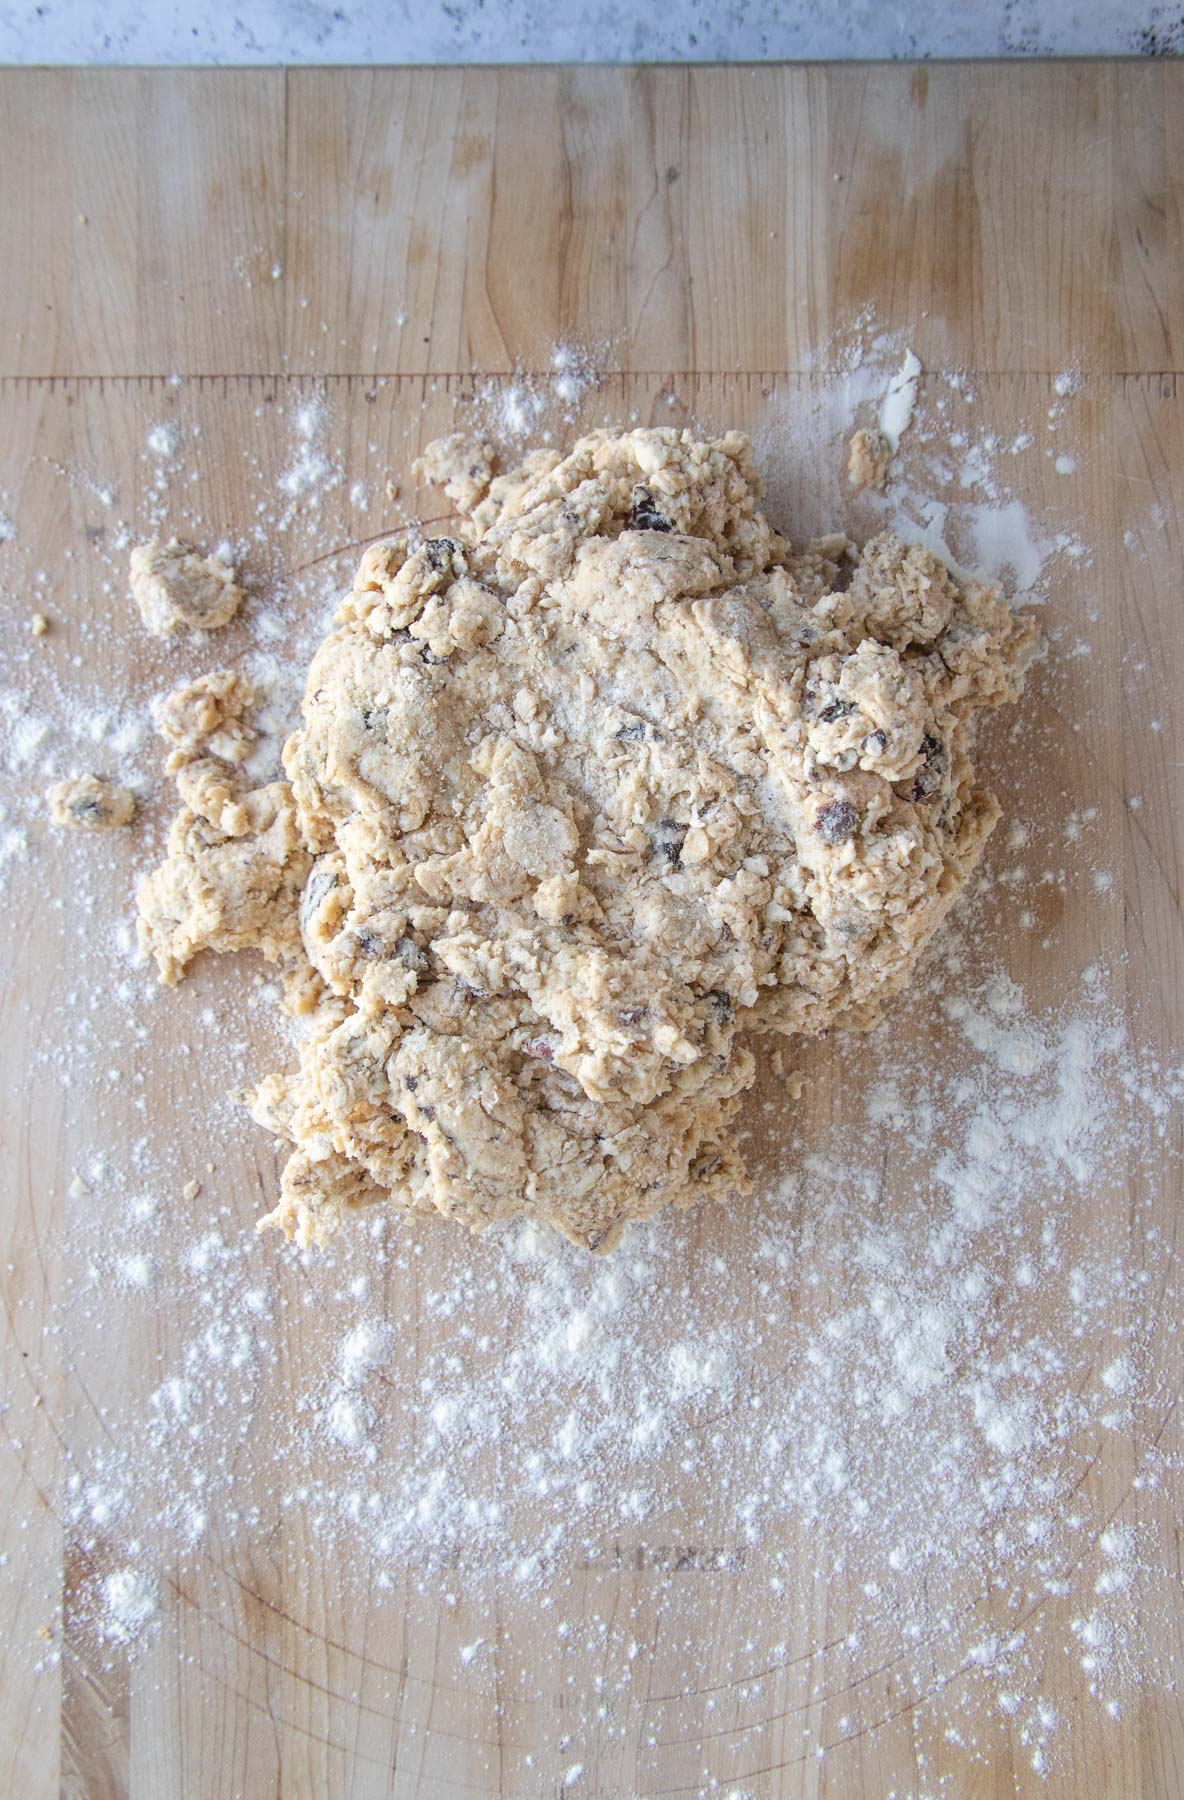 The chocolate hazelnut scone dough on a wooden board